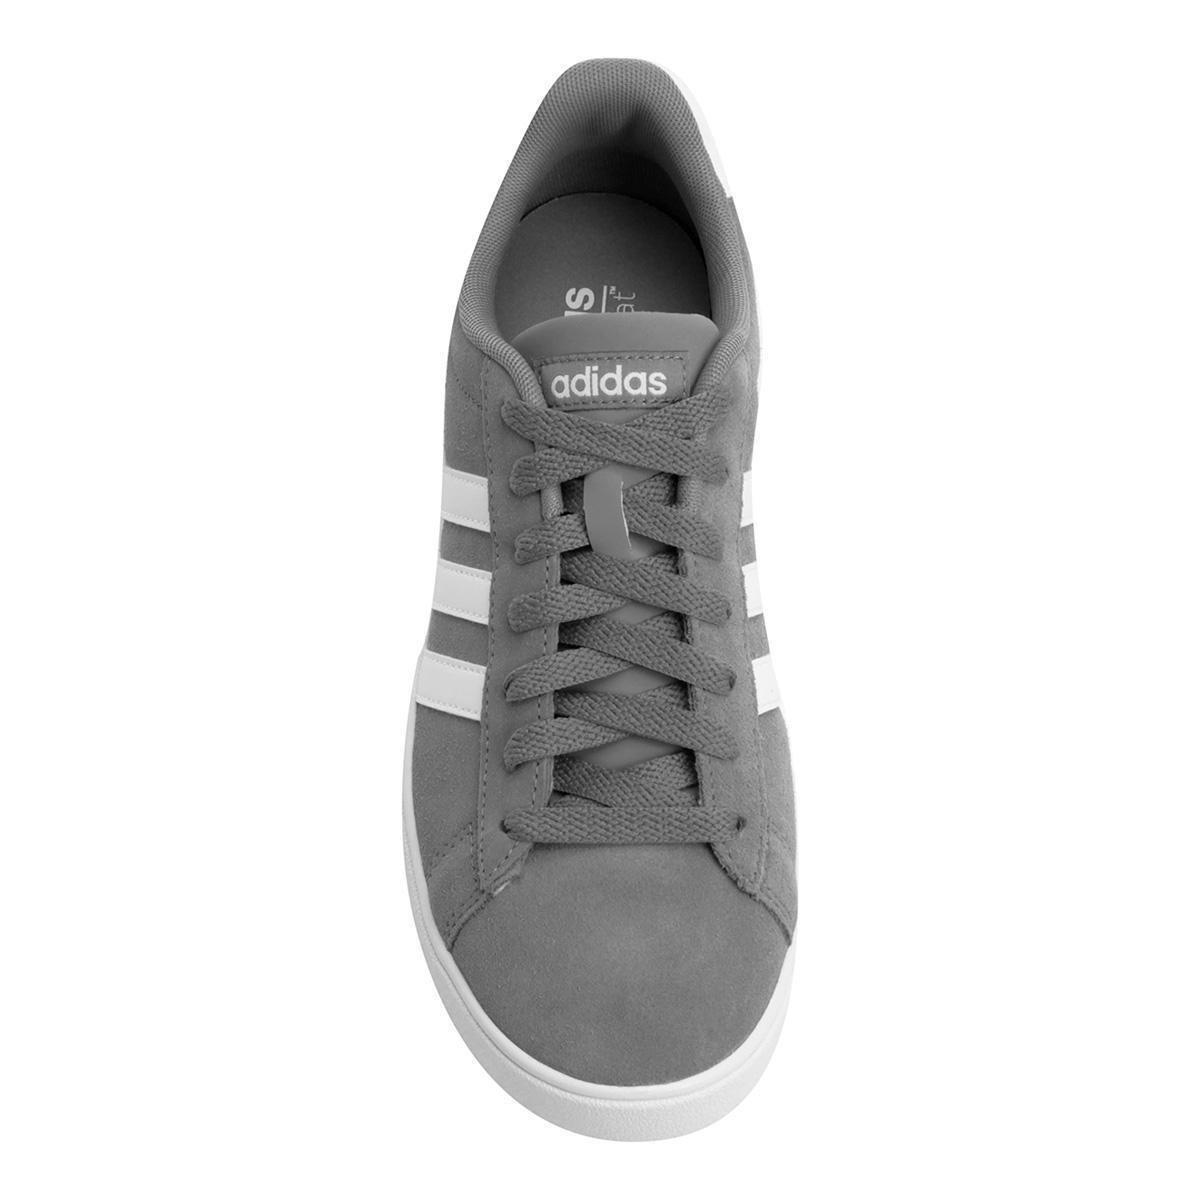 Tênis Adidas Daily 2 Masculino - Compre Agora  06d57685bbb56